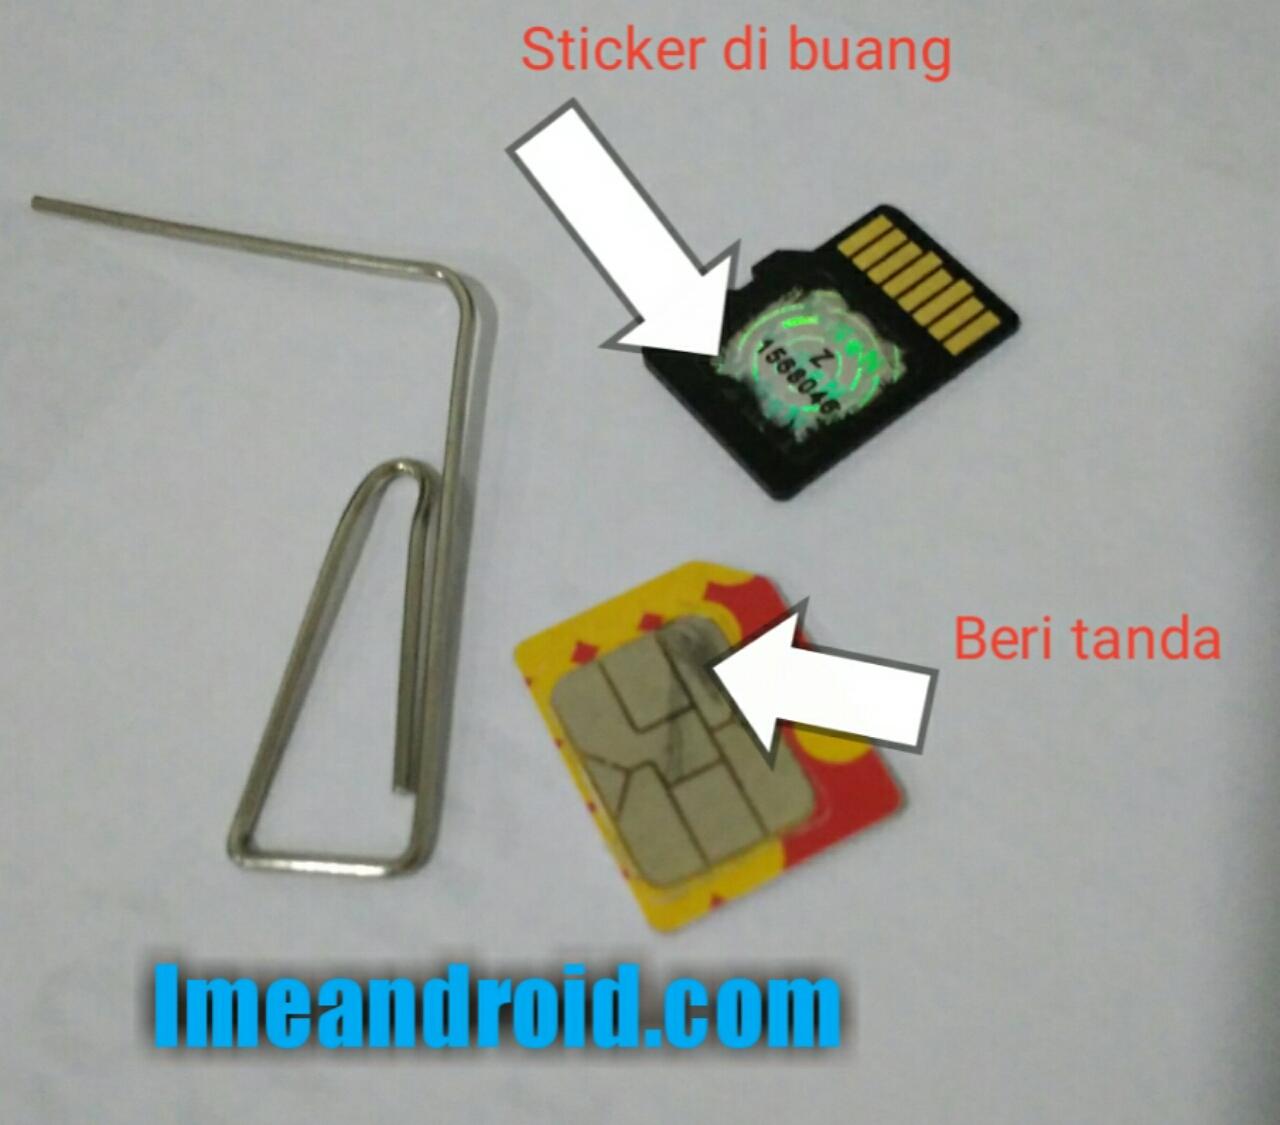 Cara memasang dual sim dan memori di hp xiaomi secara